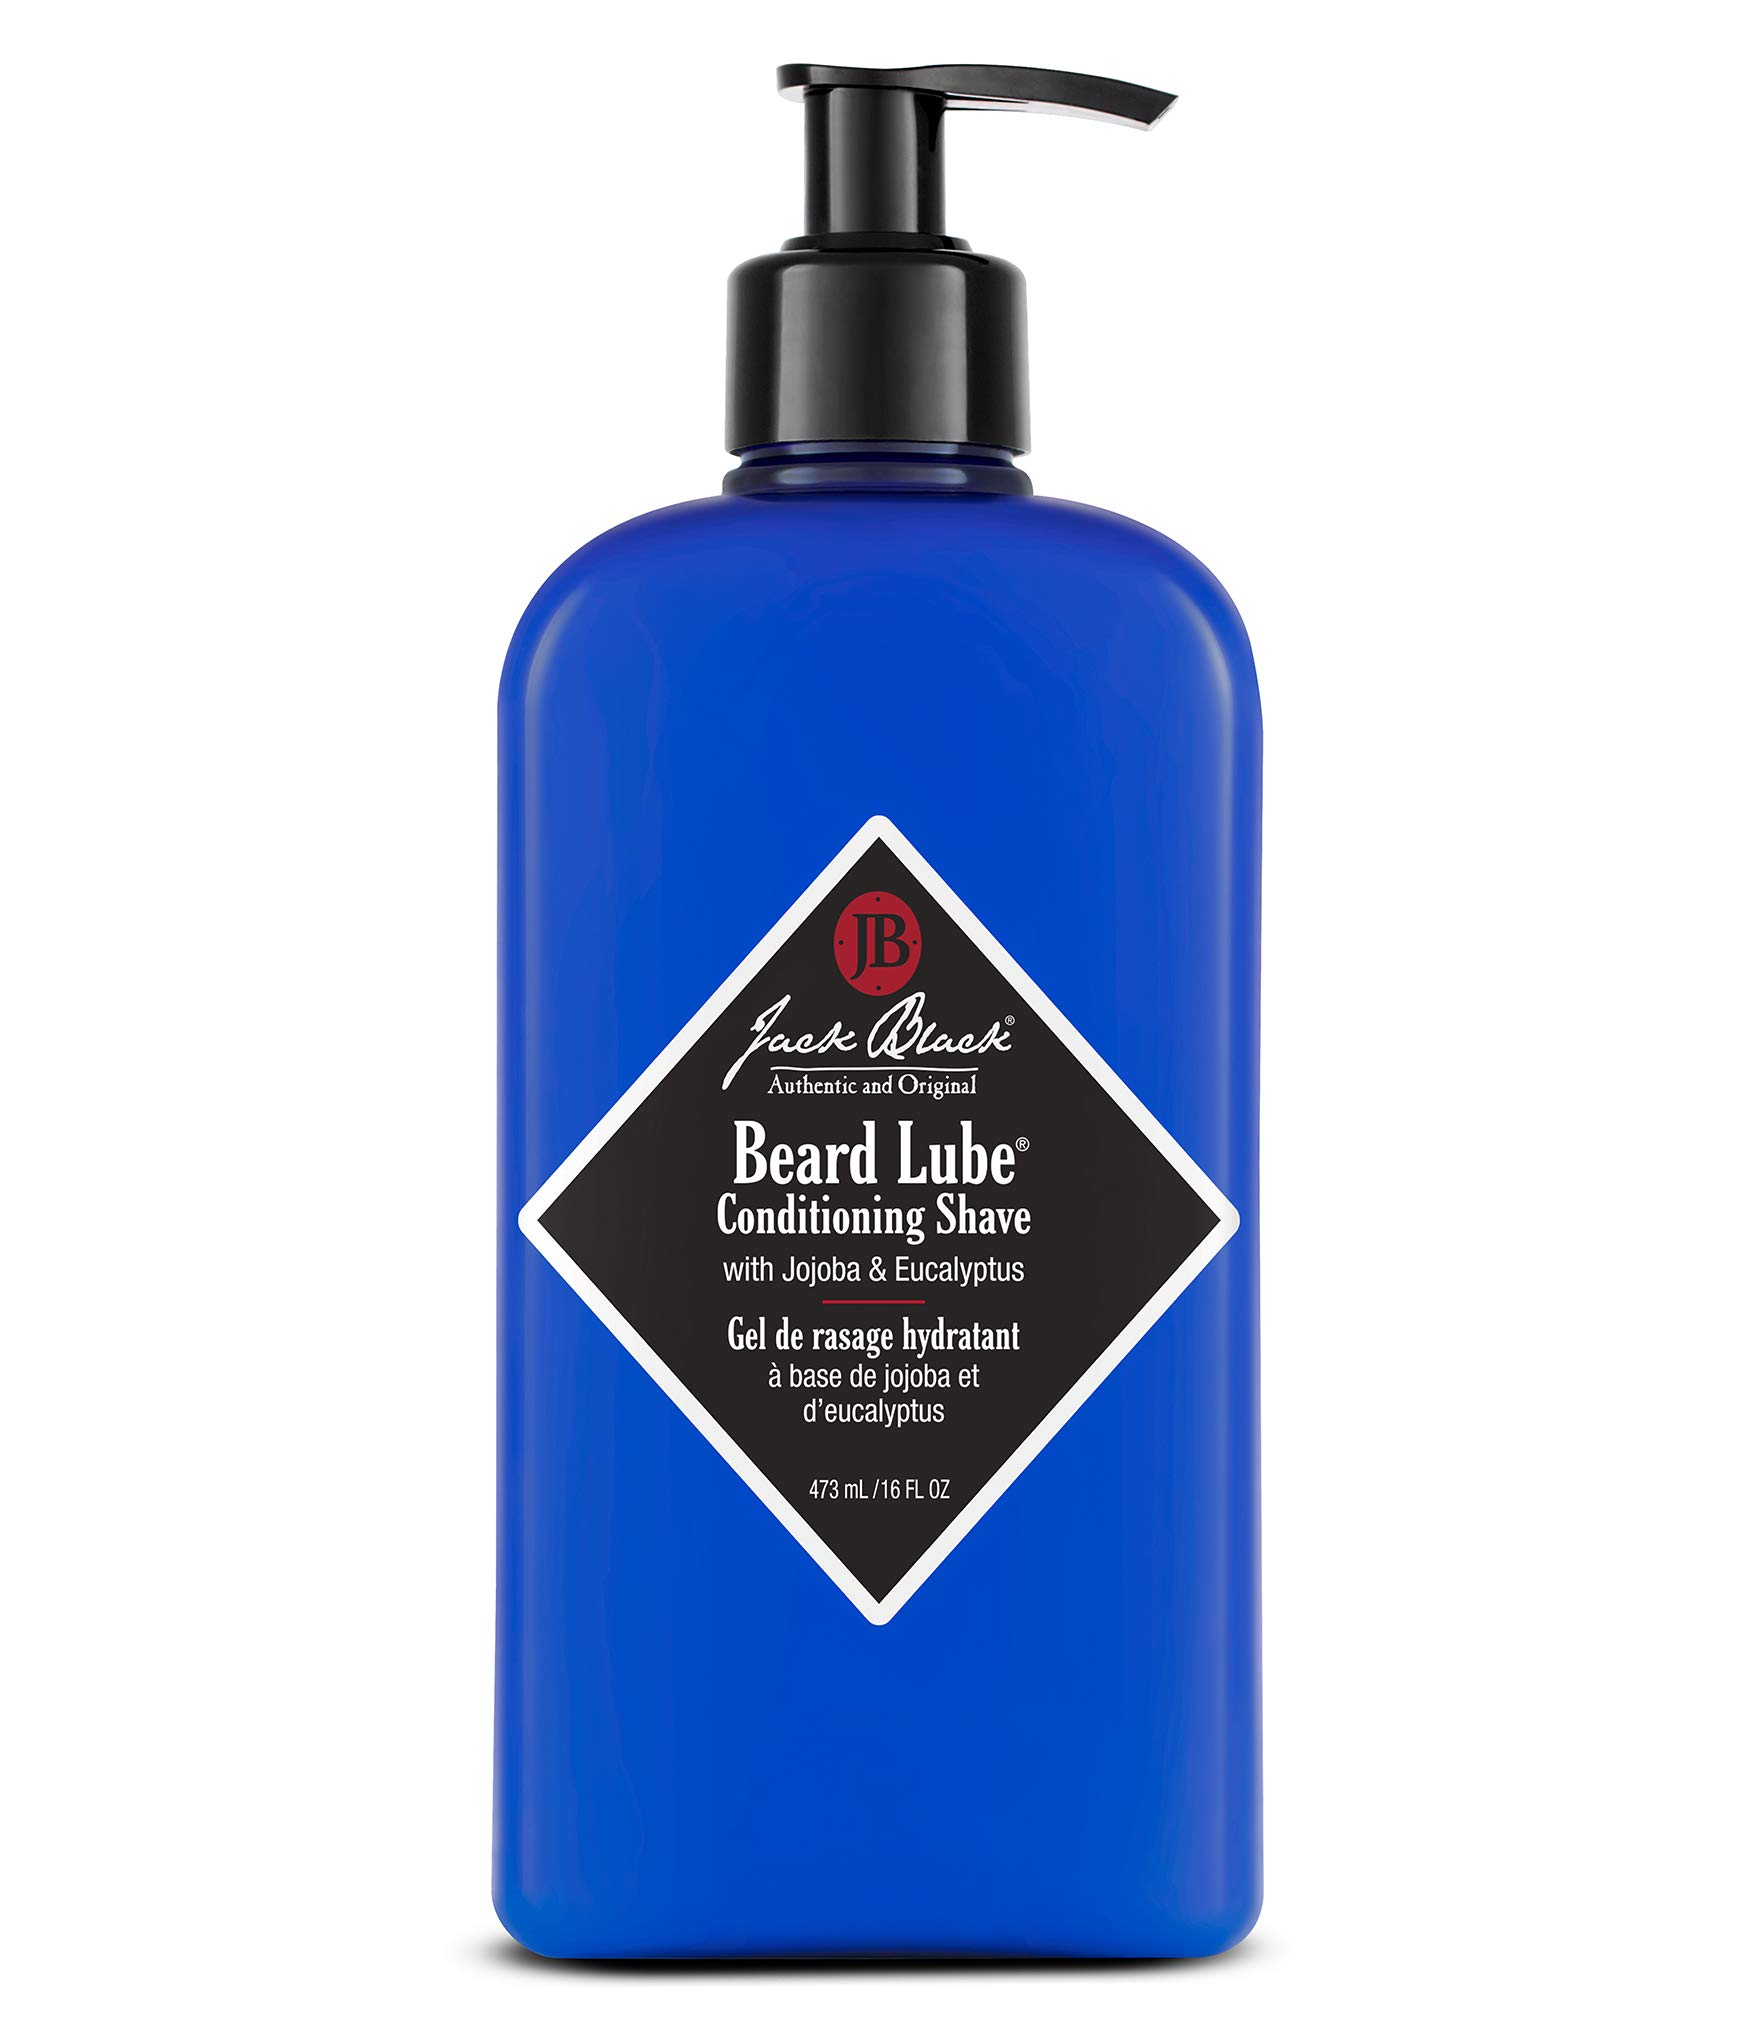 Jack Black Beard Lube Conditioning Shave, 16 fl. oz. by Jack Black